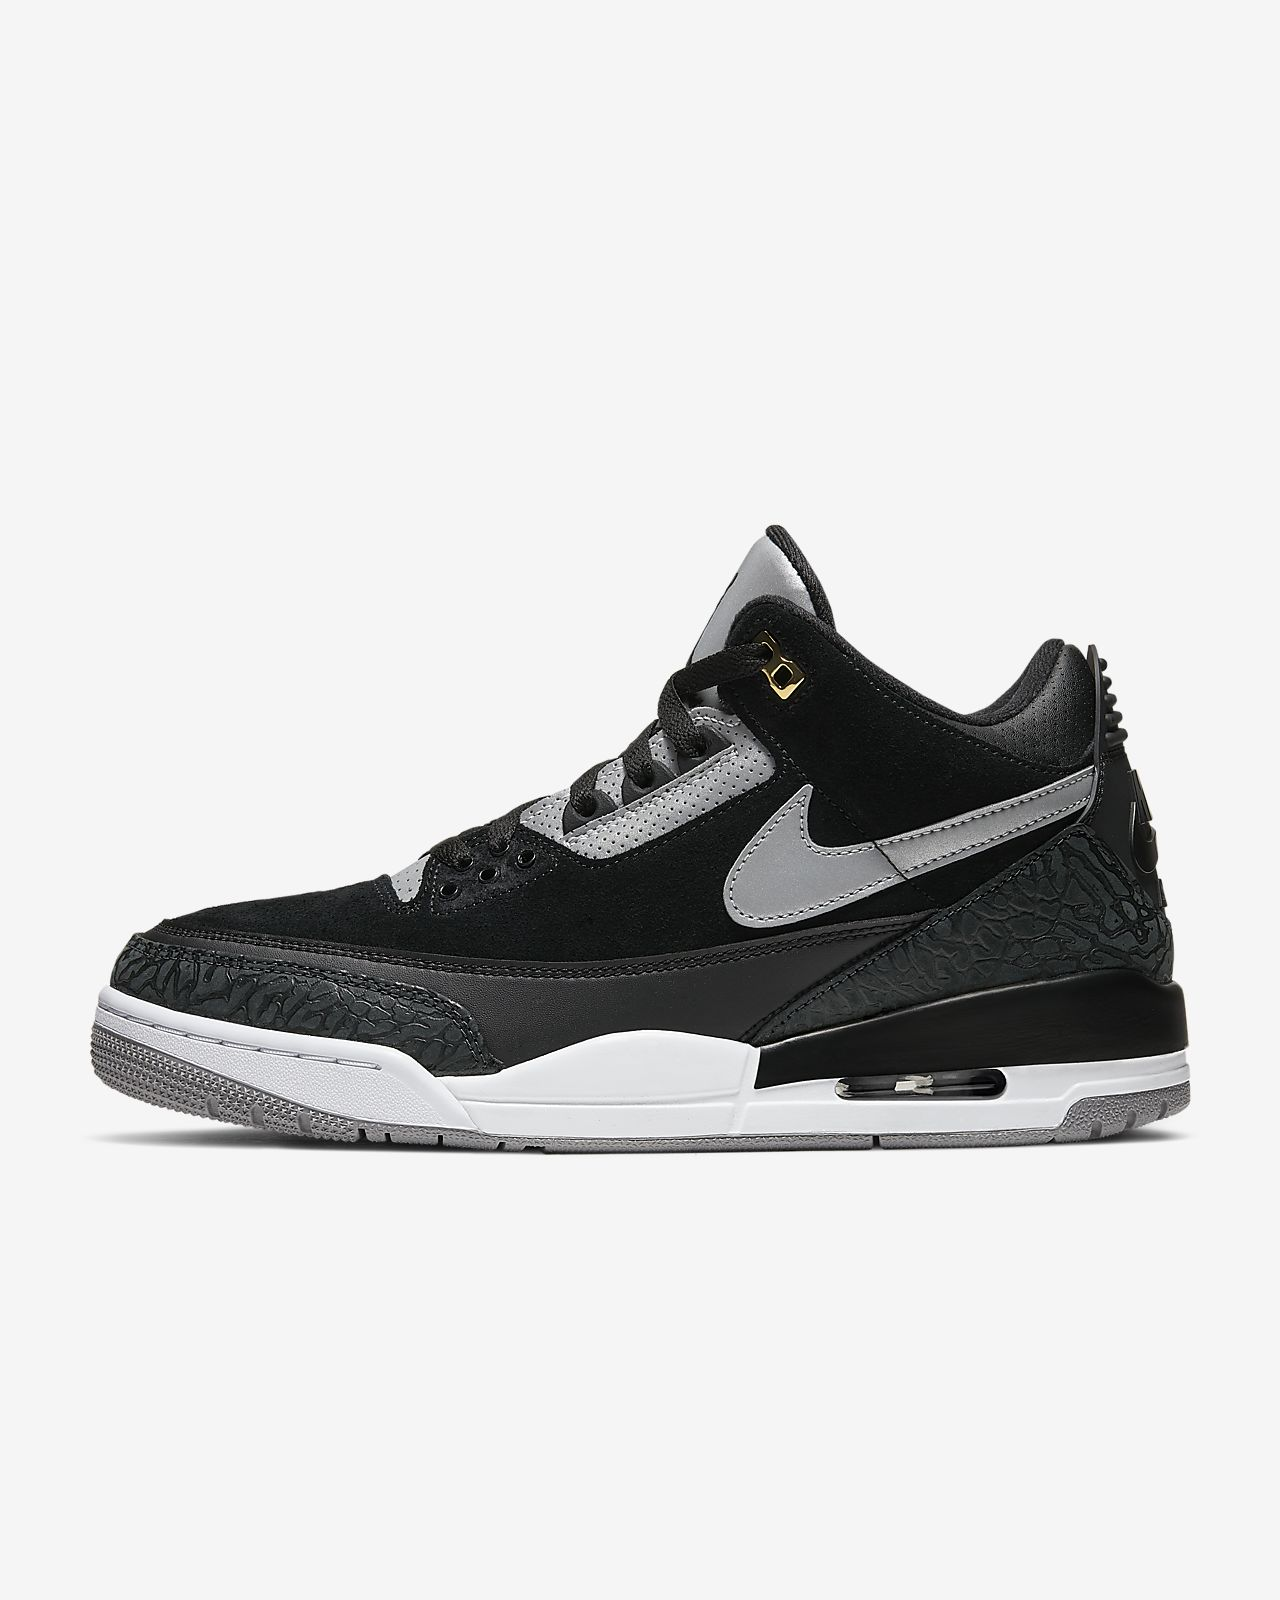 Nike Air Jordan 3 Retro Mädchen Lifestyle Schuhe Im Schwarz